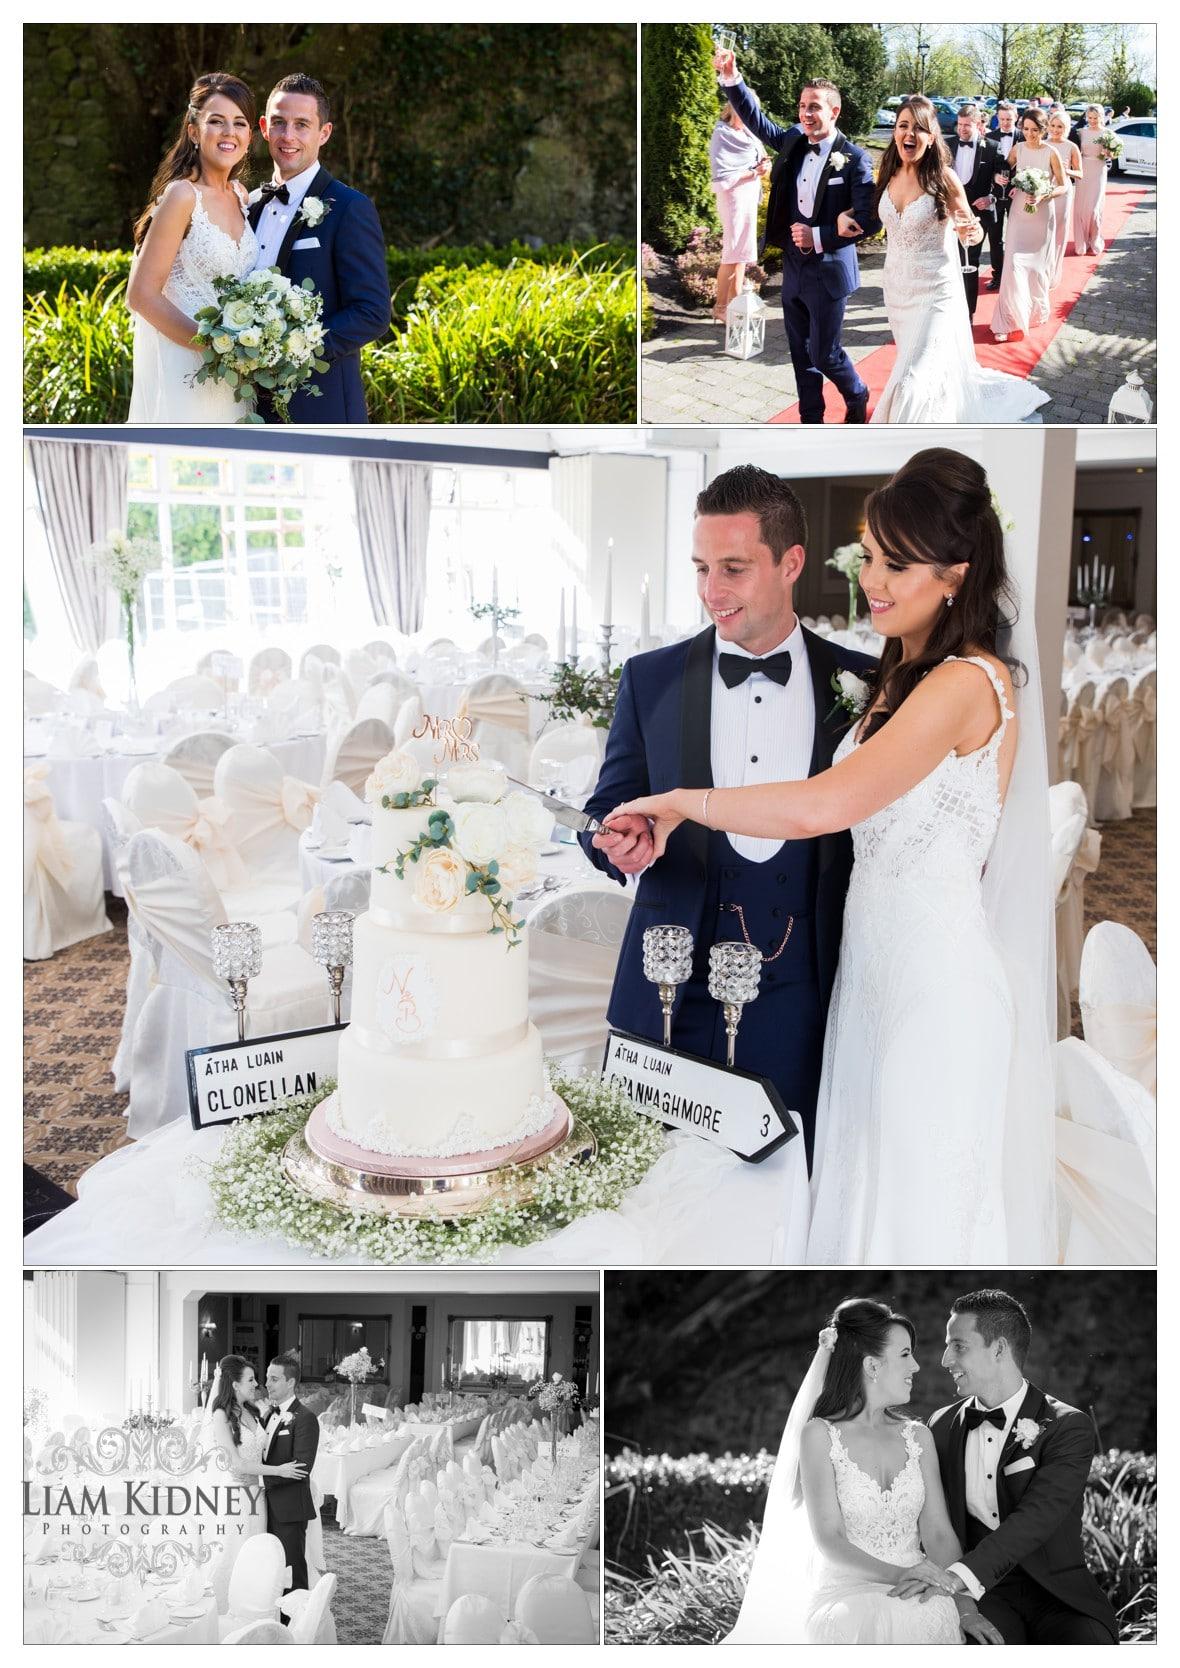 Wedding in the Shamrock Lodge Hotel in Athlone